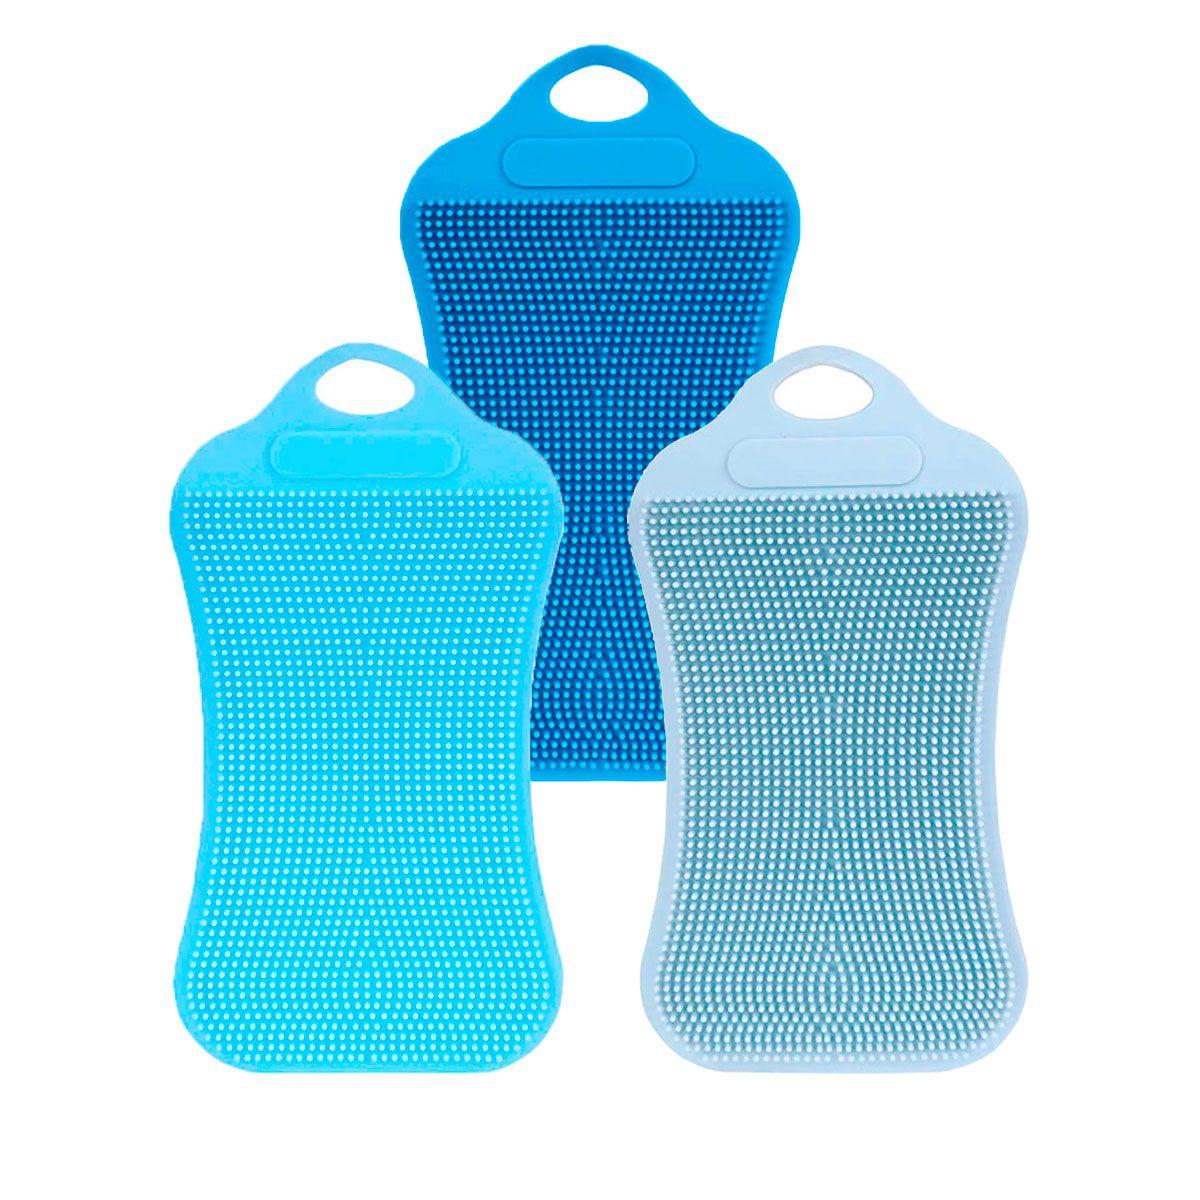 Kit c/ 3 Esponjas de Silicone Retangulares